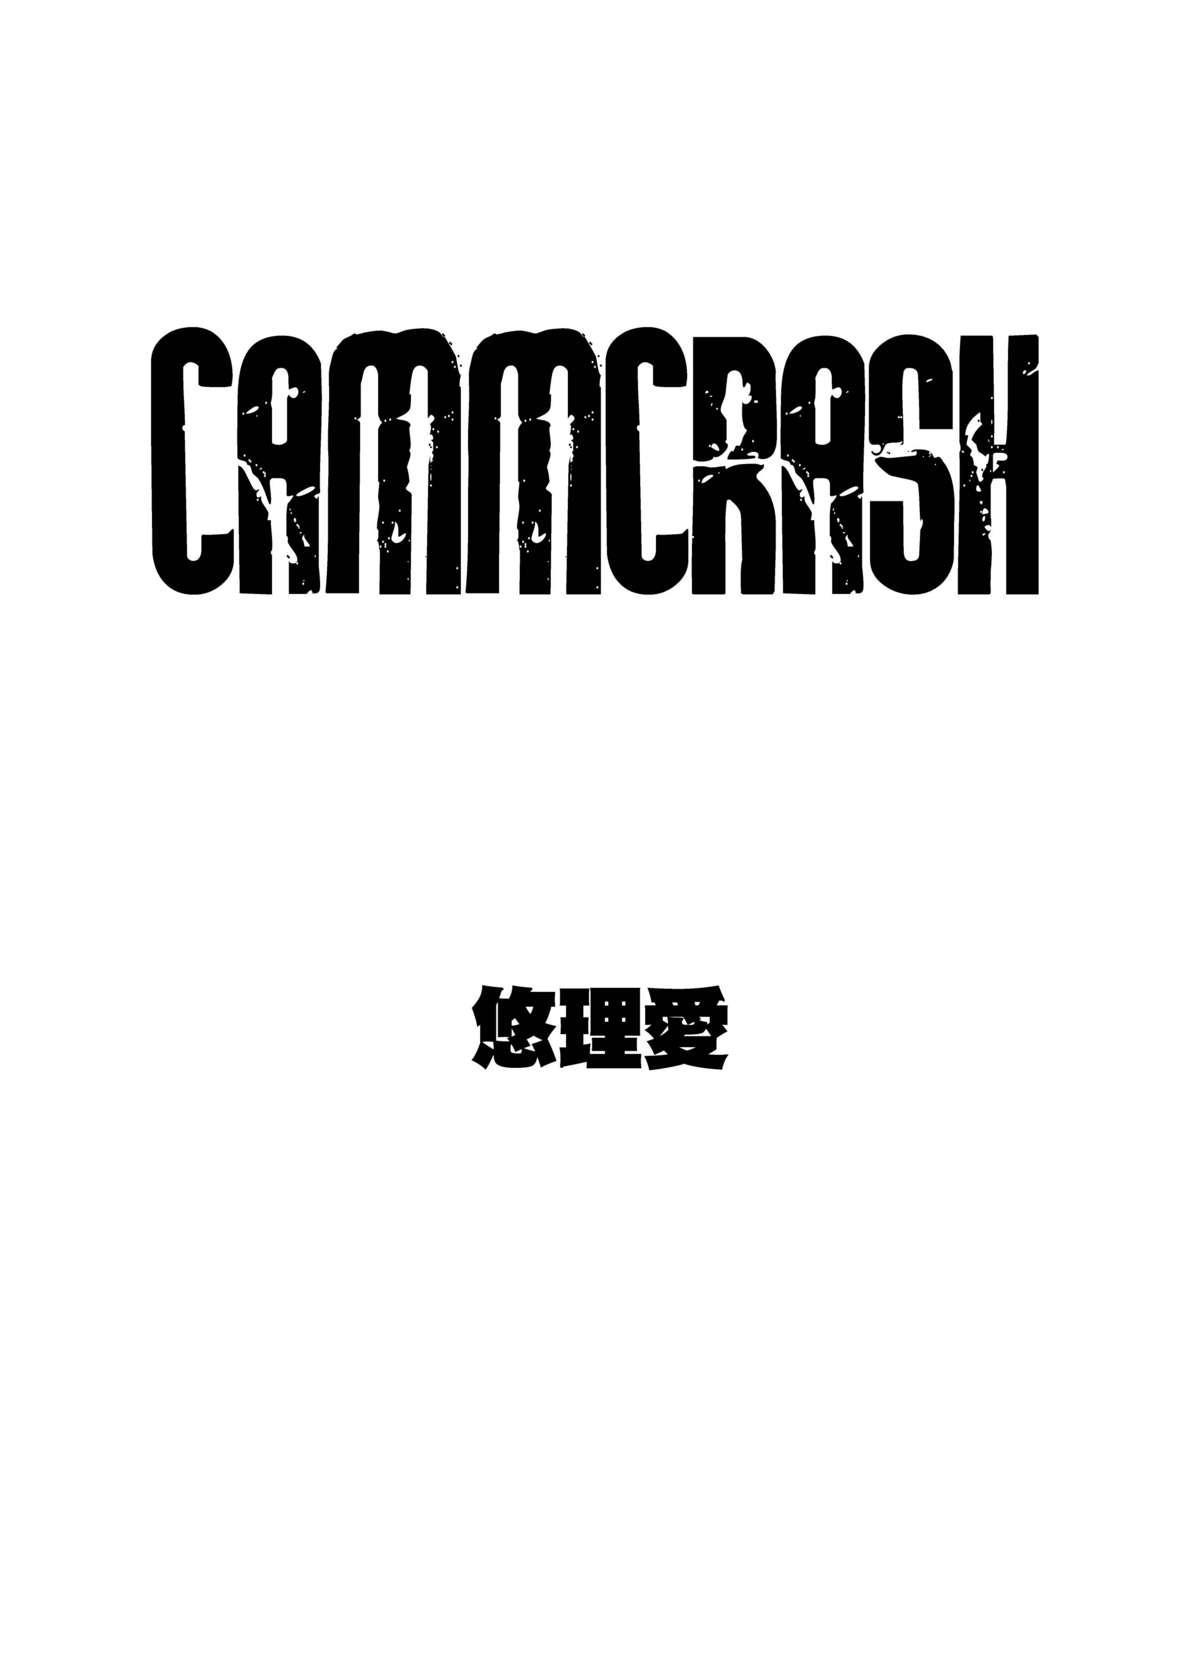 CAMMCRASH 1